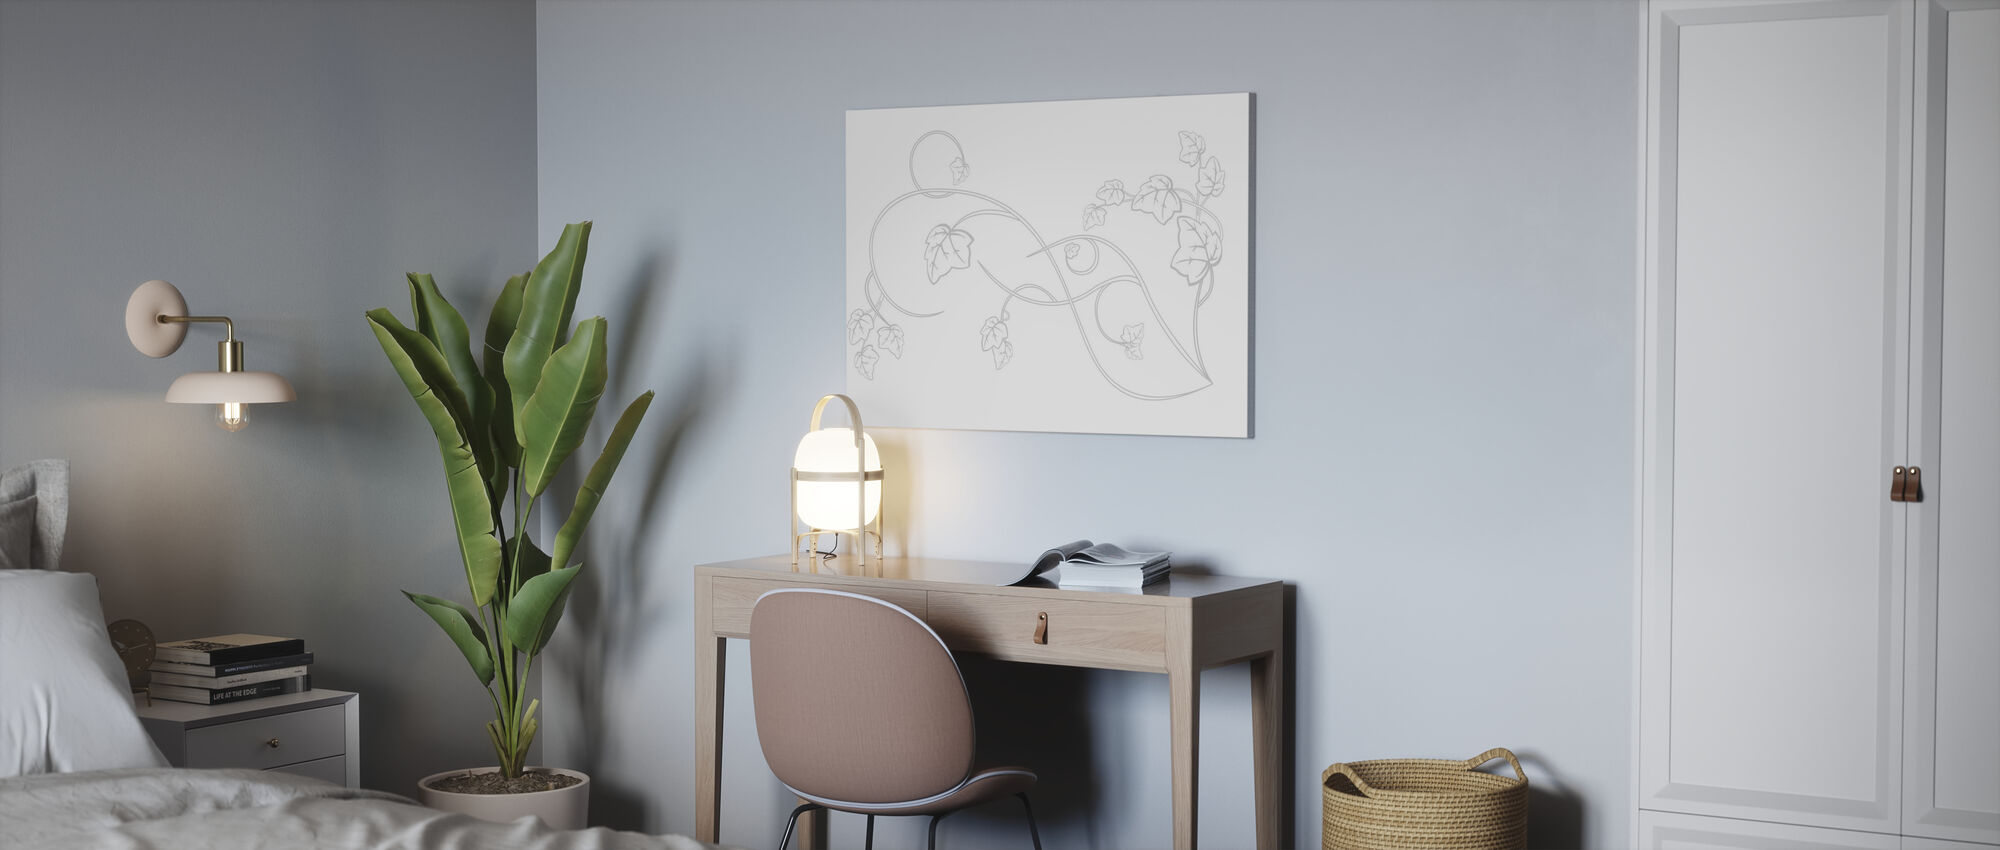 Ranka - Impression sur toile - Bureau